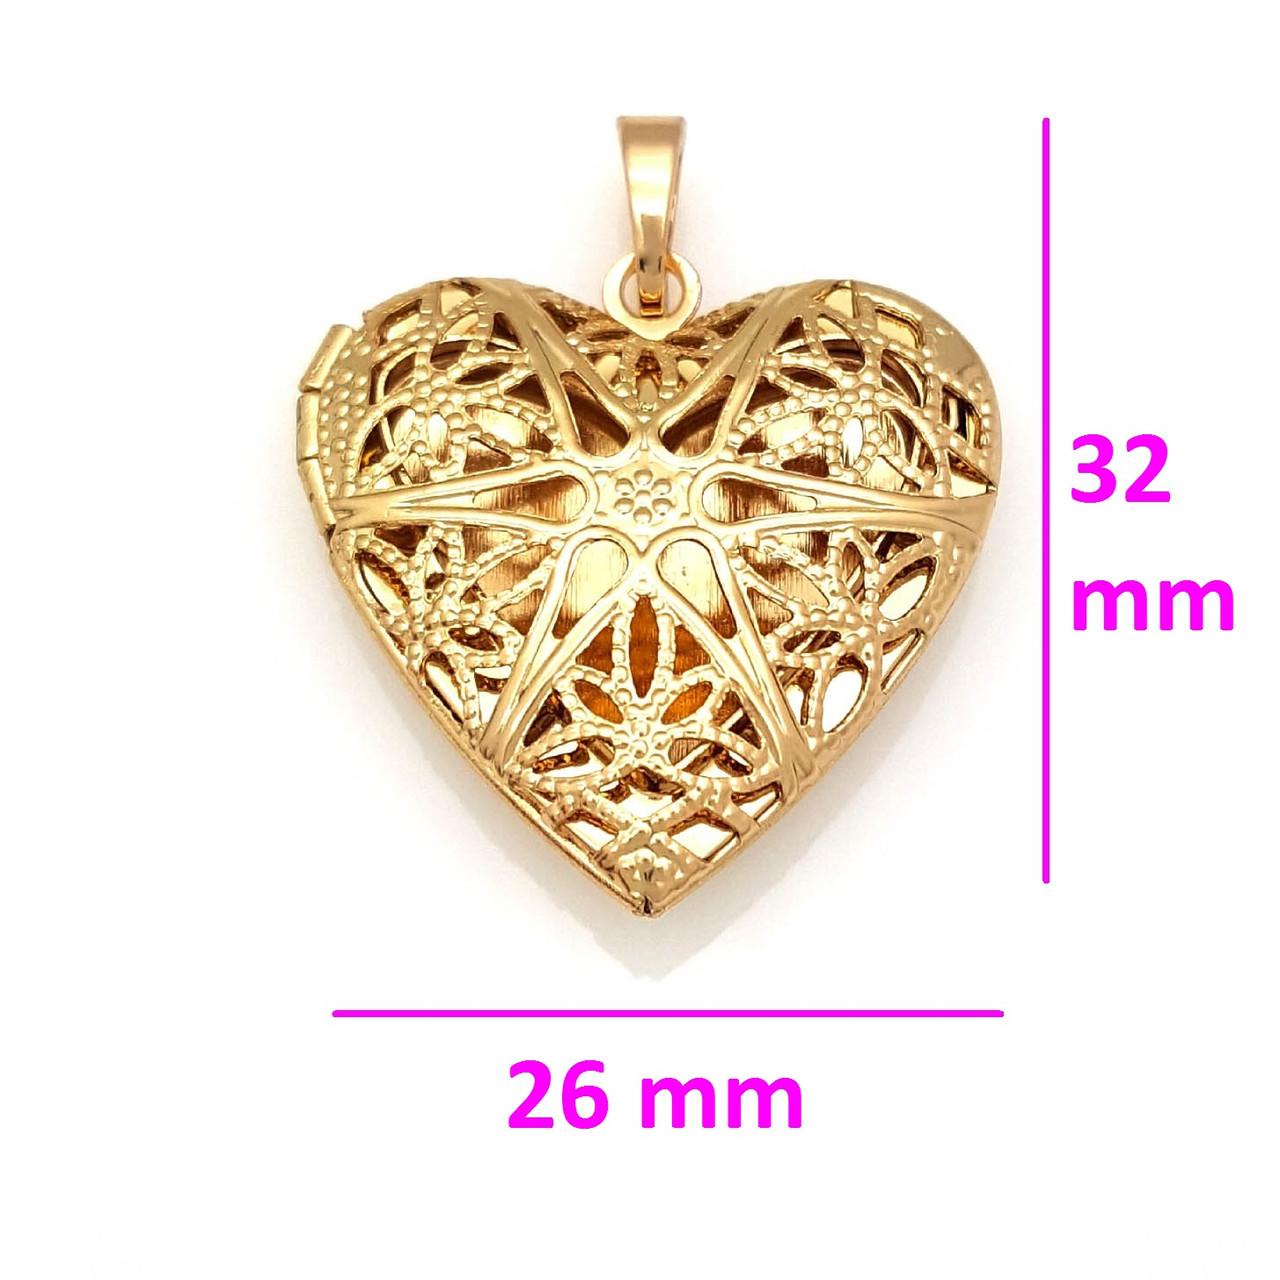 Кулон-медальон, медзолото, Ажурное сердце, без камней